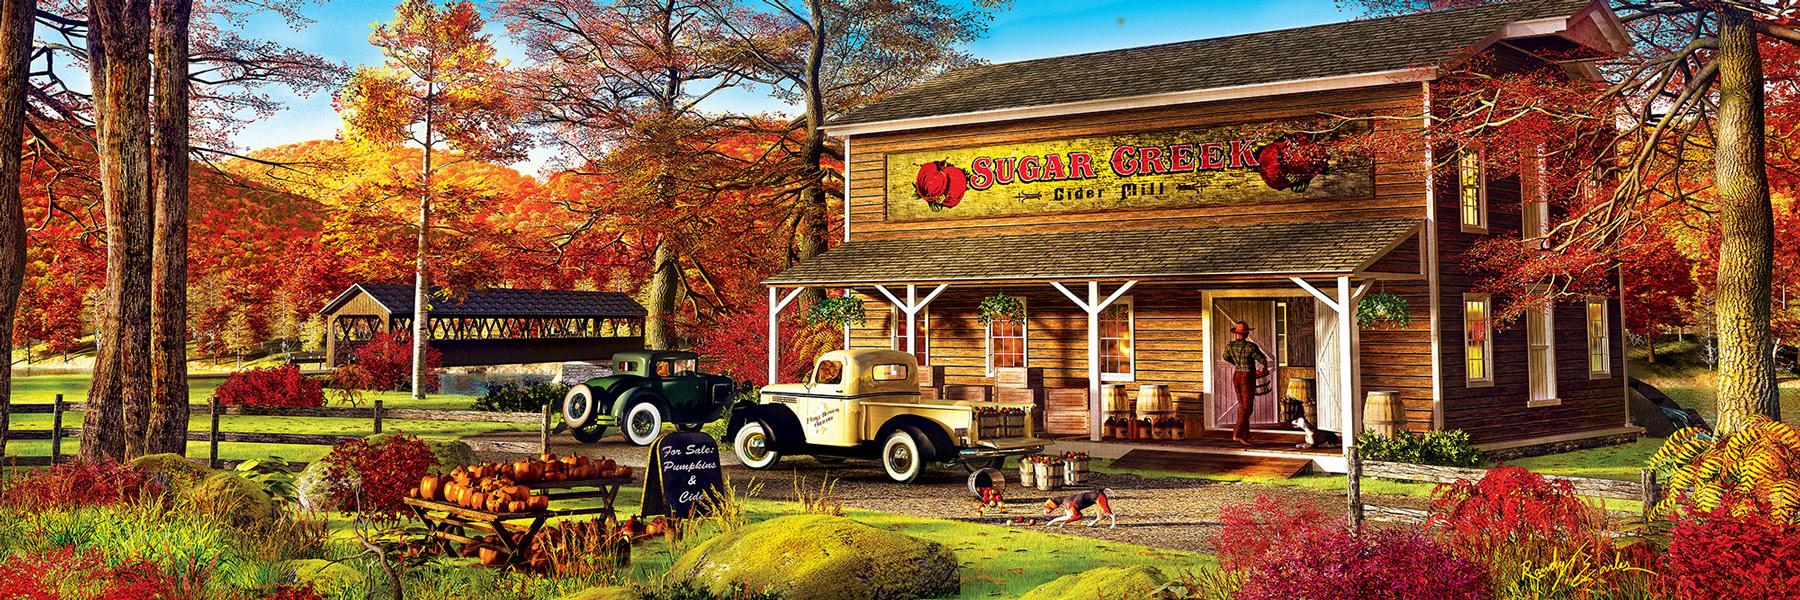 Sugar Creek Cider Mill Countryside Jigsaw Puzzle